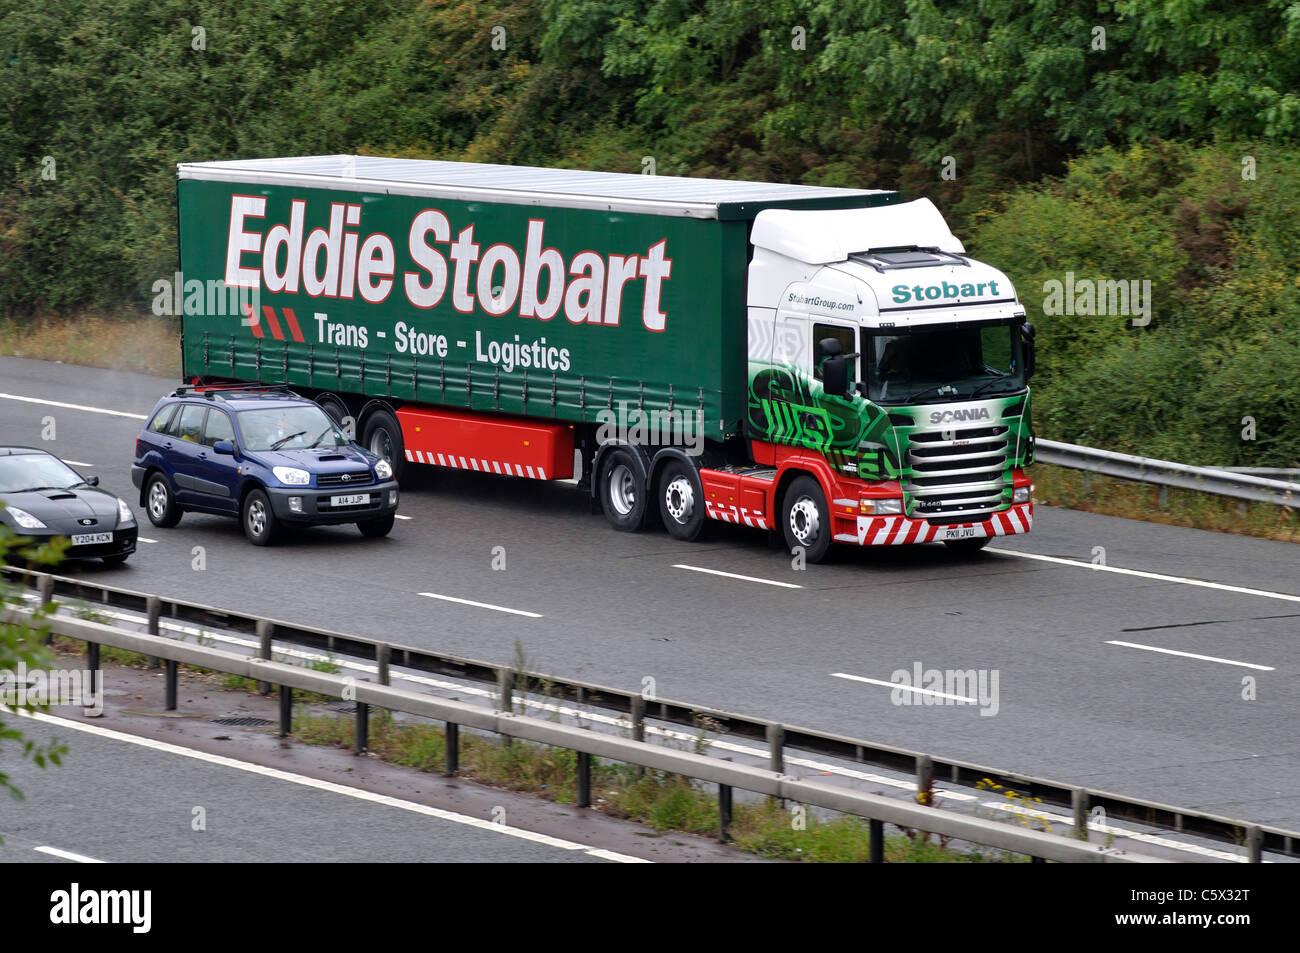 Eddie Stobart lorry on M40 motorway, Warwickshire, UK Stock Photo